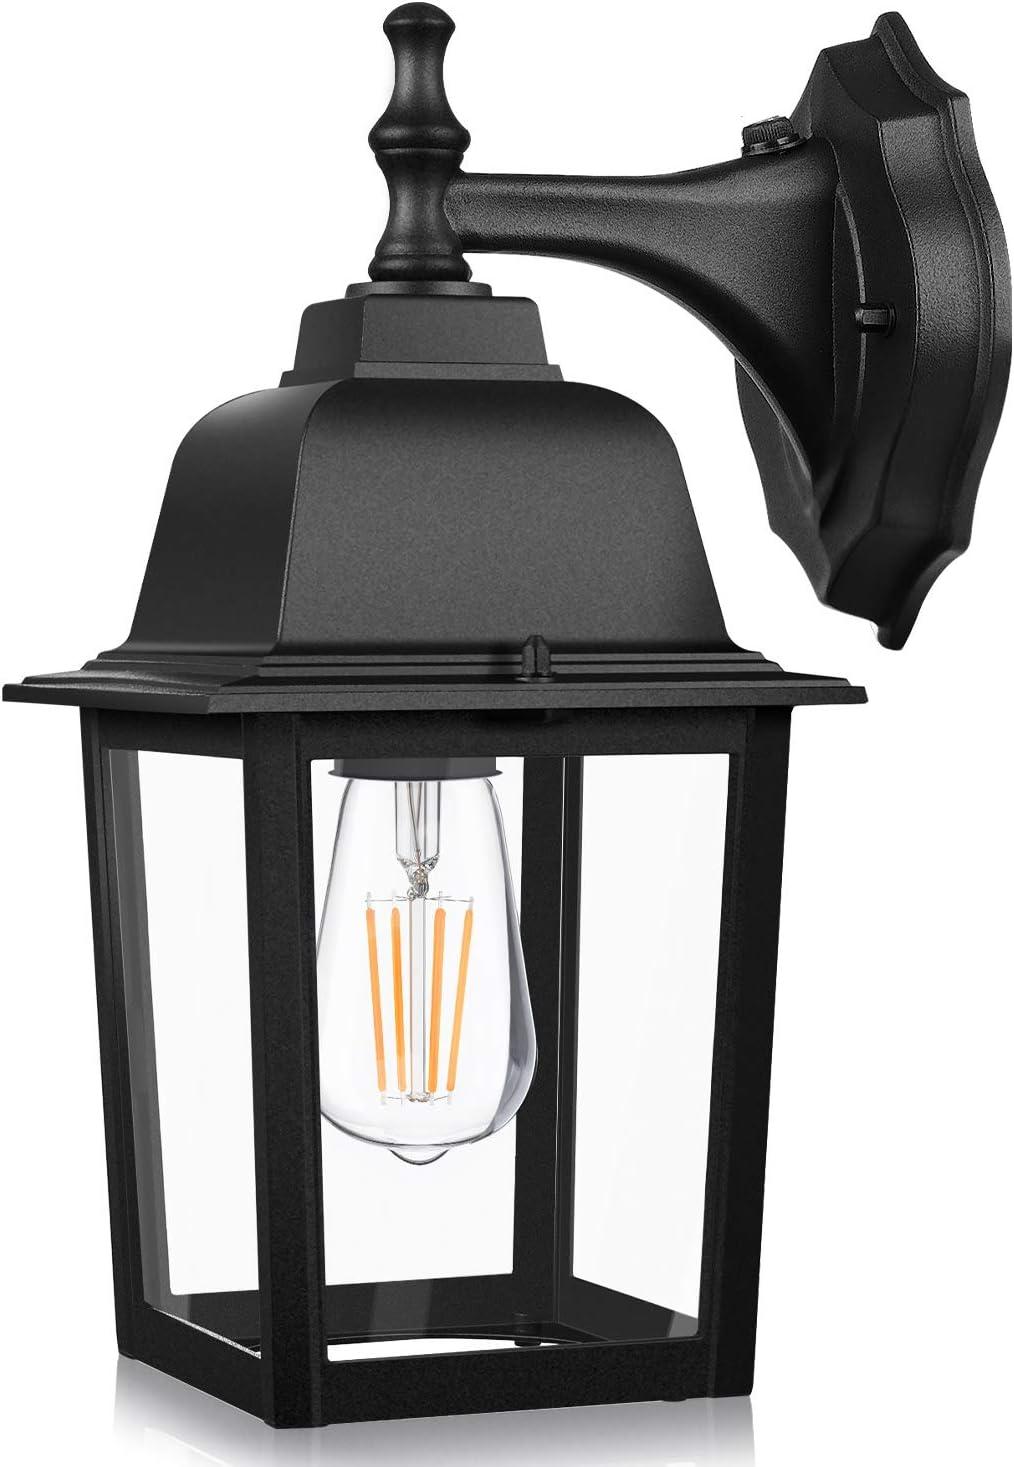 Vintage Dusk to Dawn Sensor Outdoor Wall Lantern Wall Sconce Porch Light Fixture